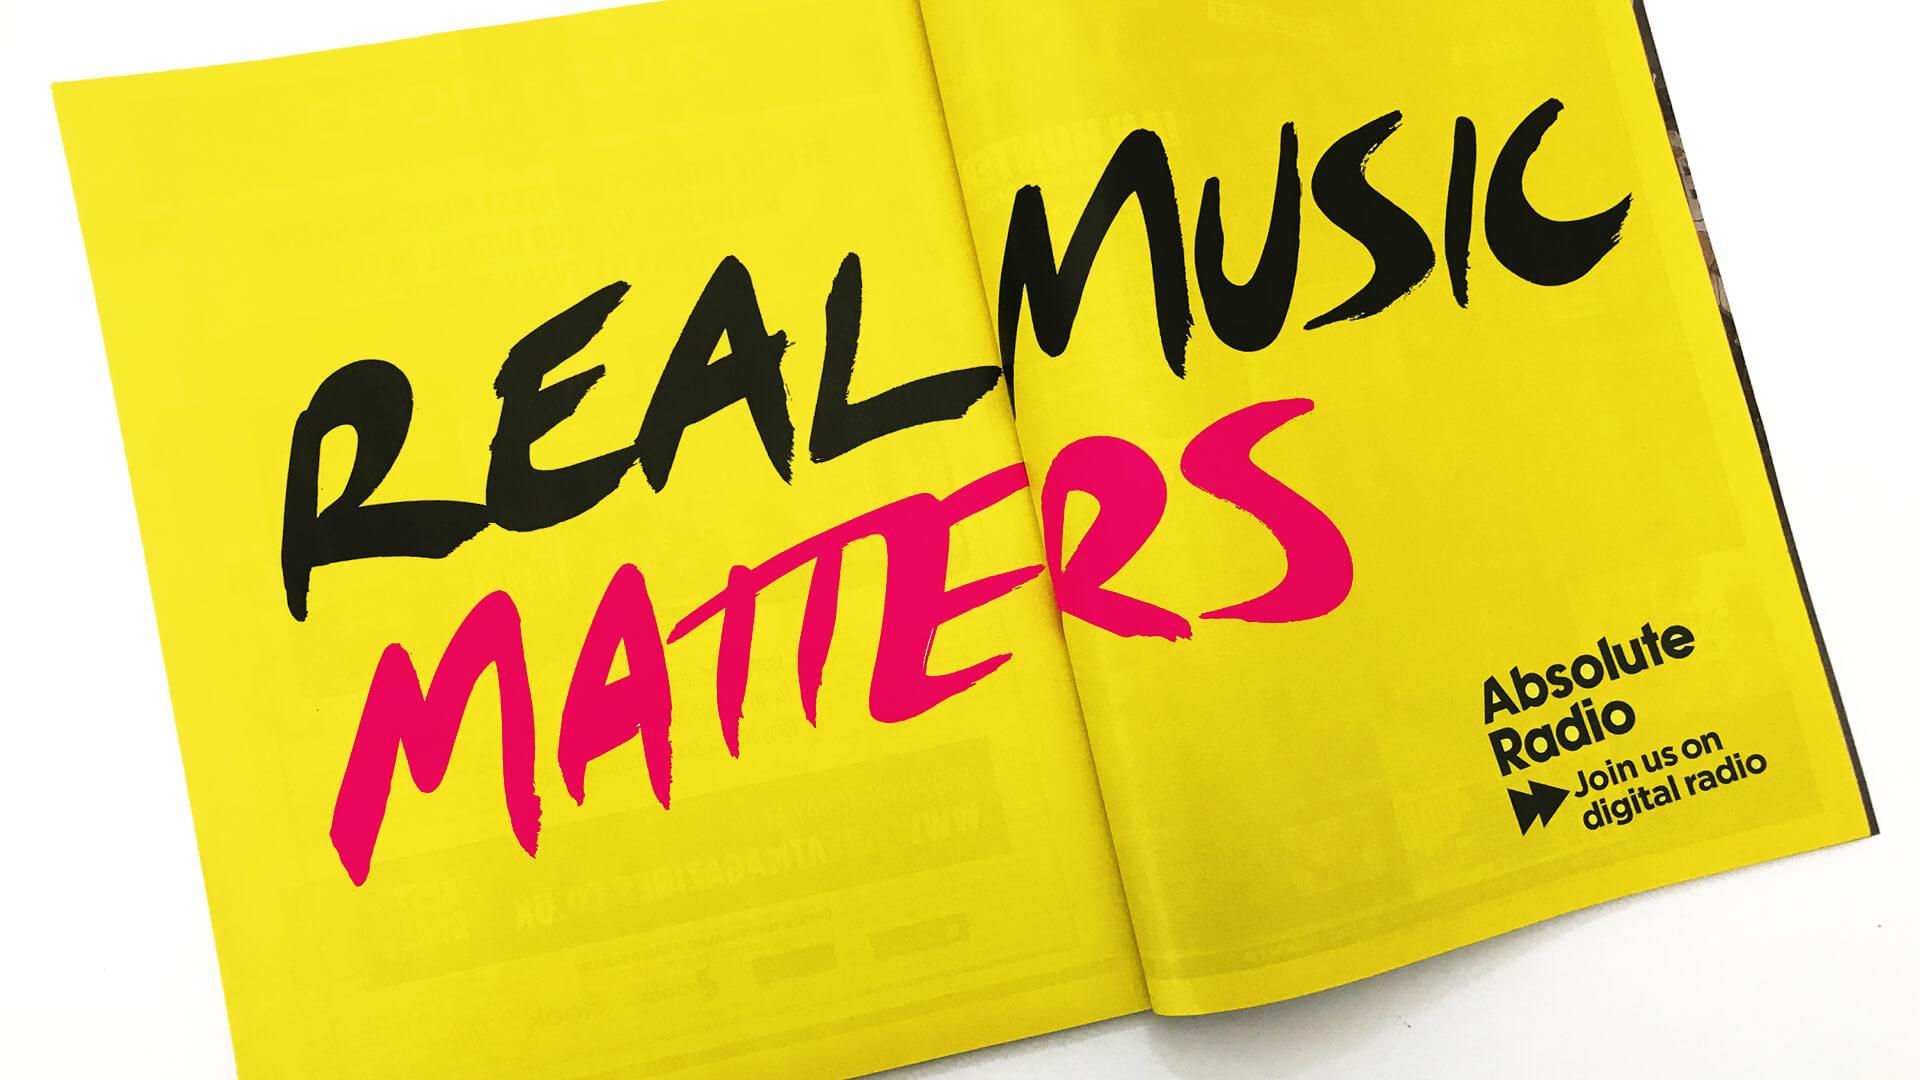 Absolute radio magazine advertising campaign